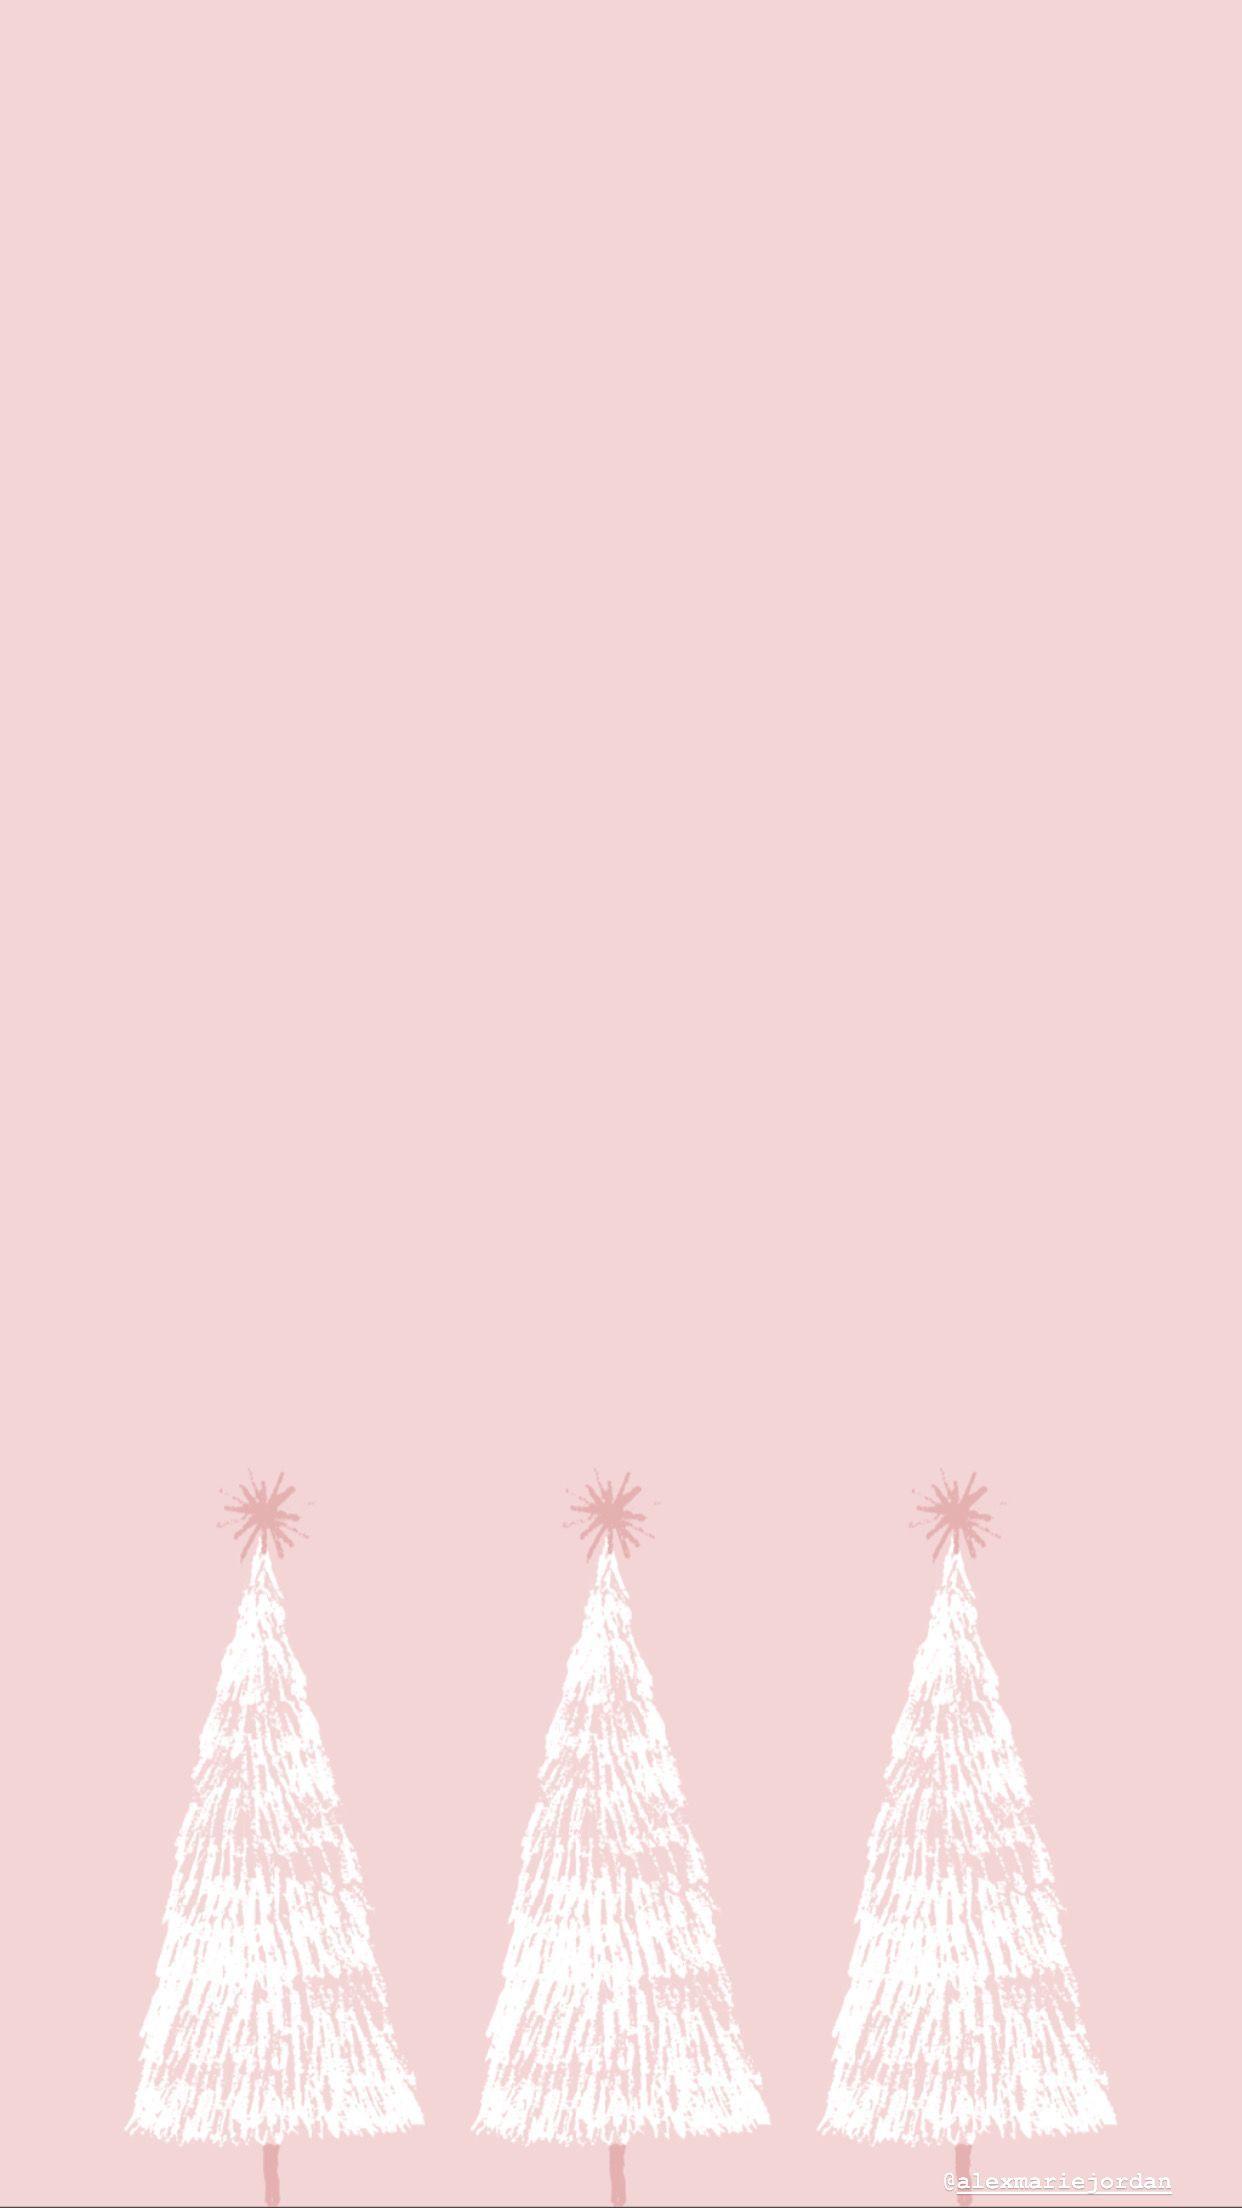 Boho Christmas Wallpapers Wallpaper Cave